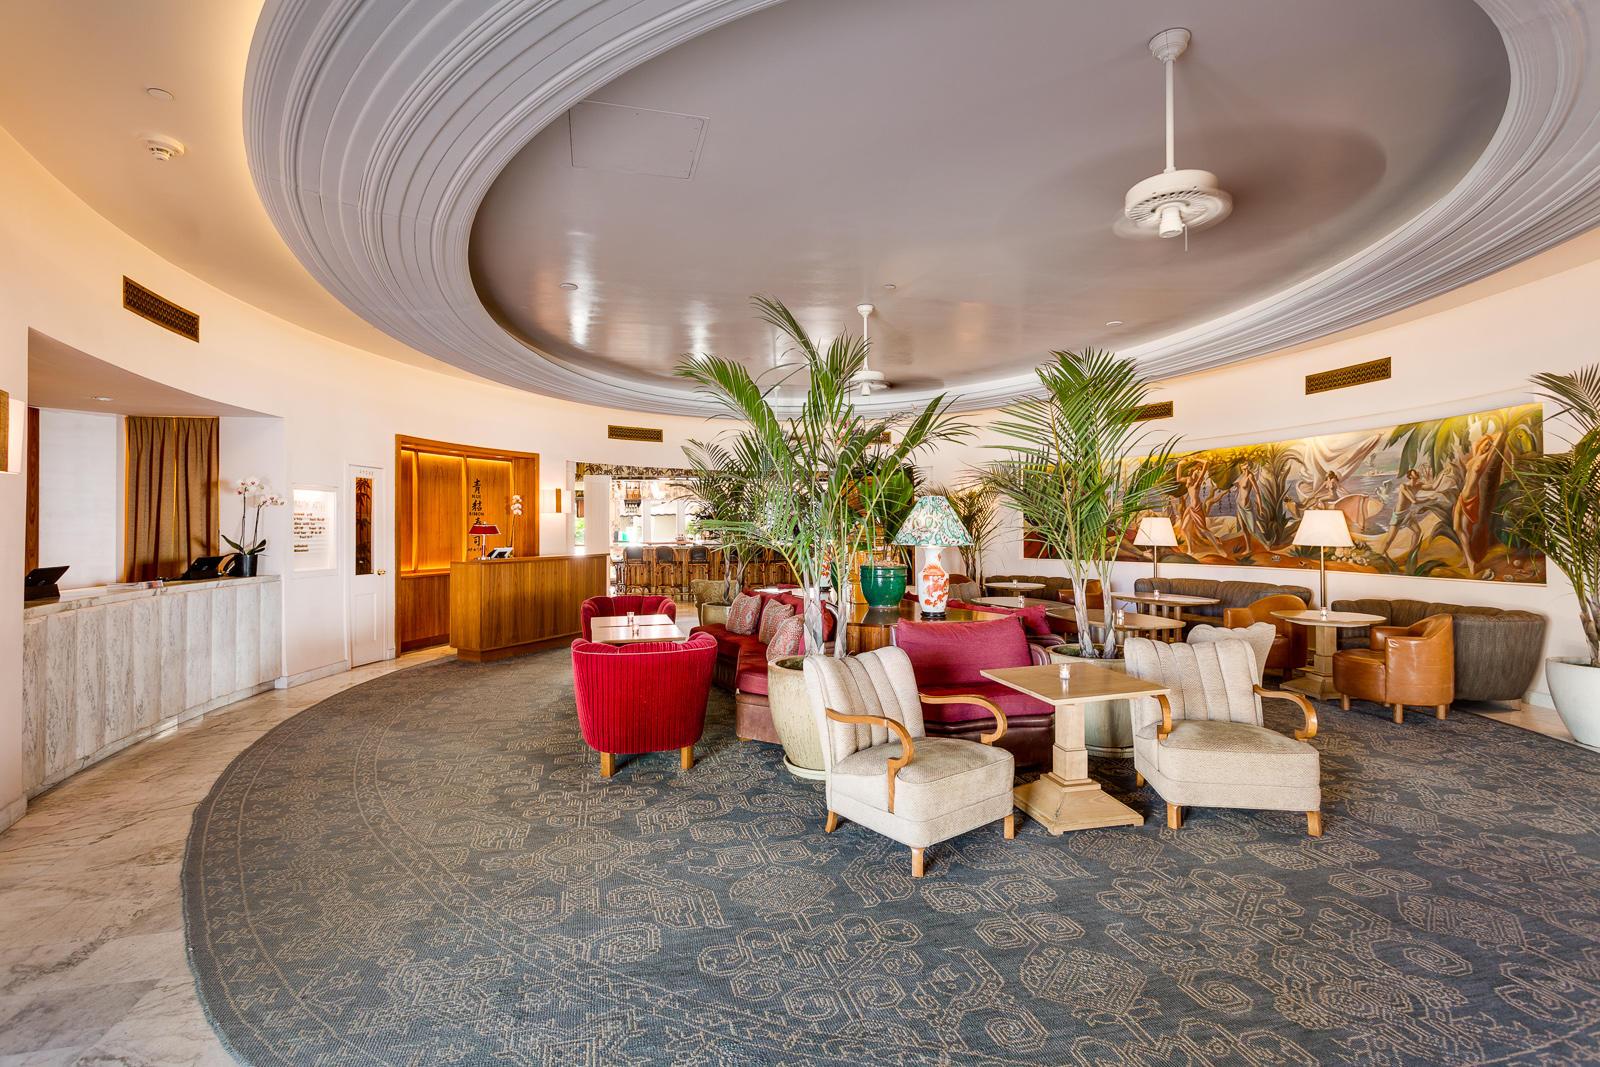 Deco Nature Salon the plymouth south beach   luxury boutique hotel   miami beach